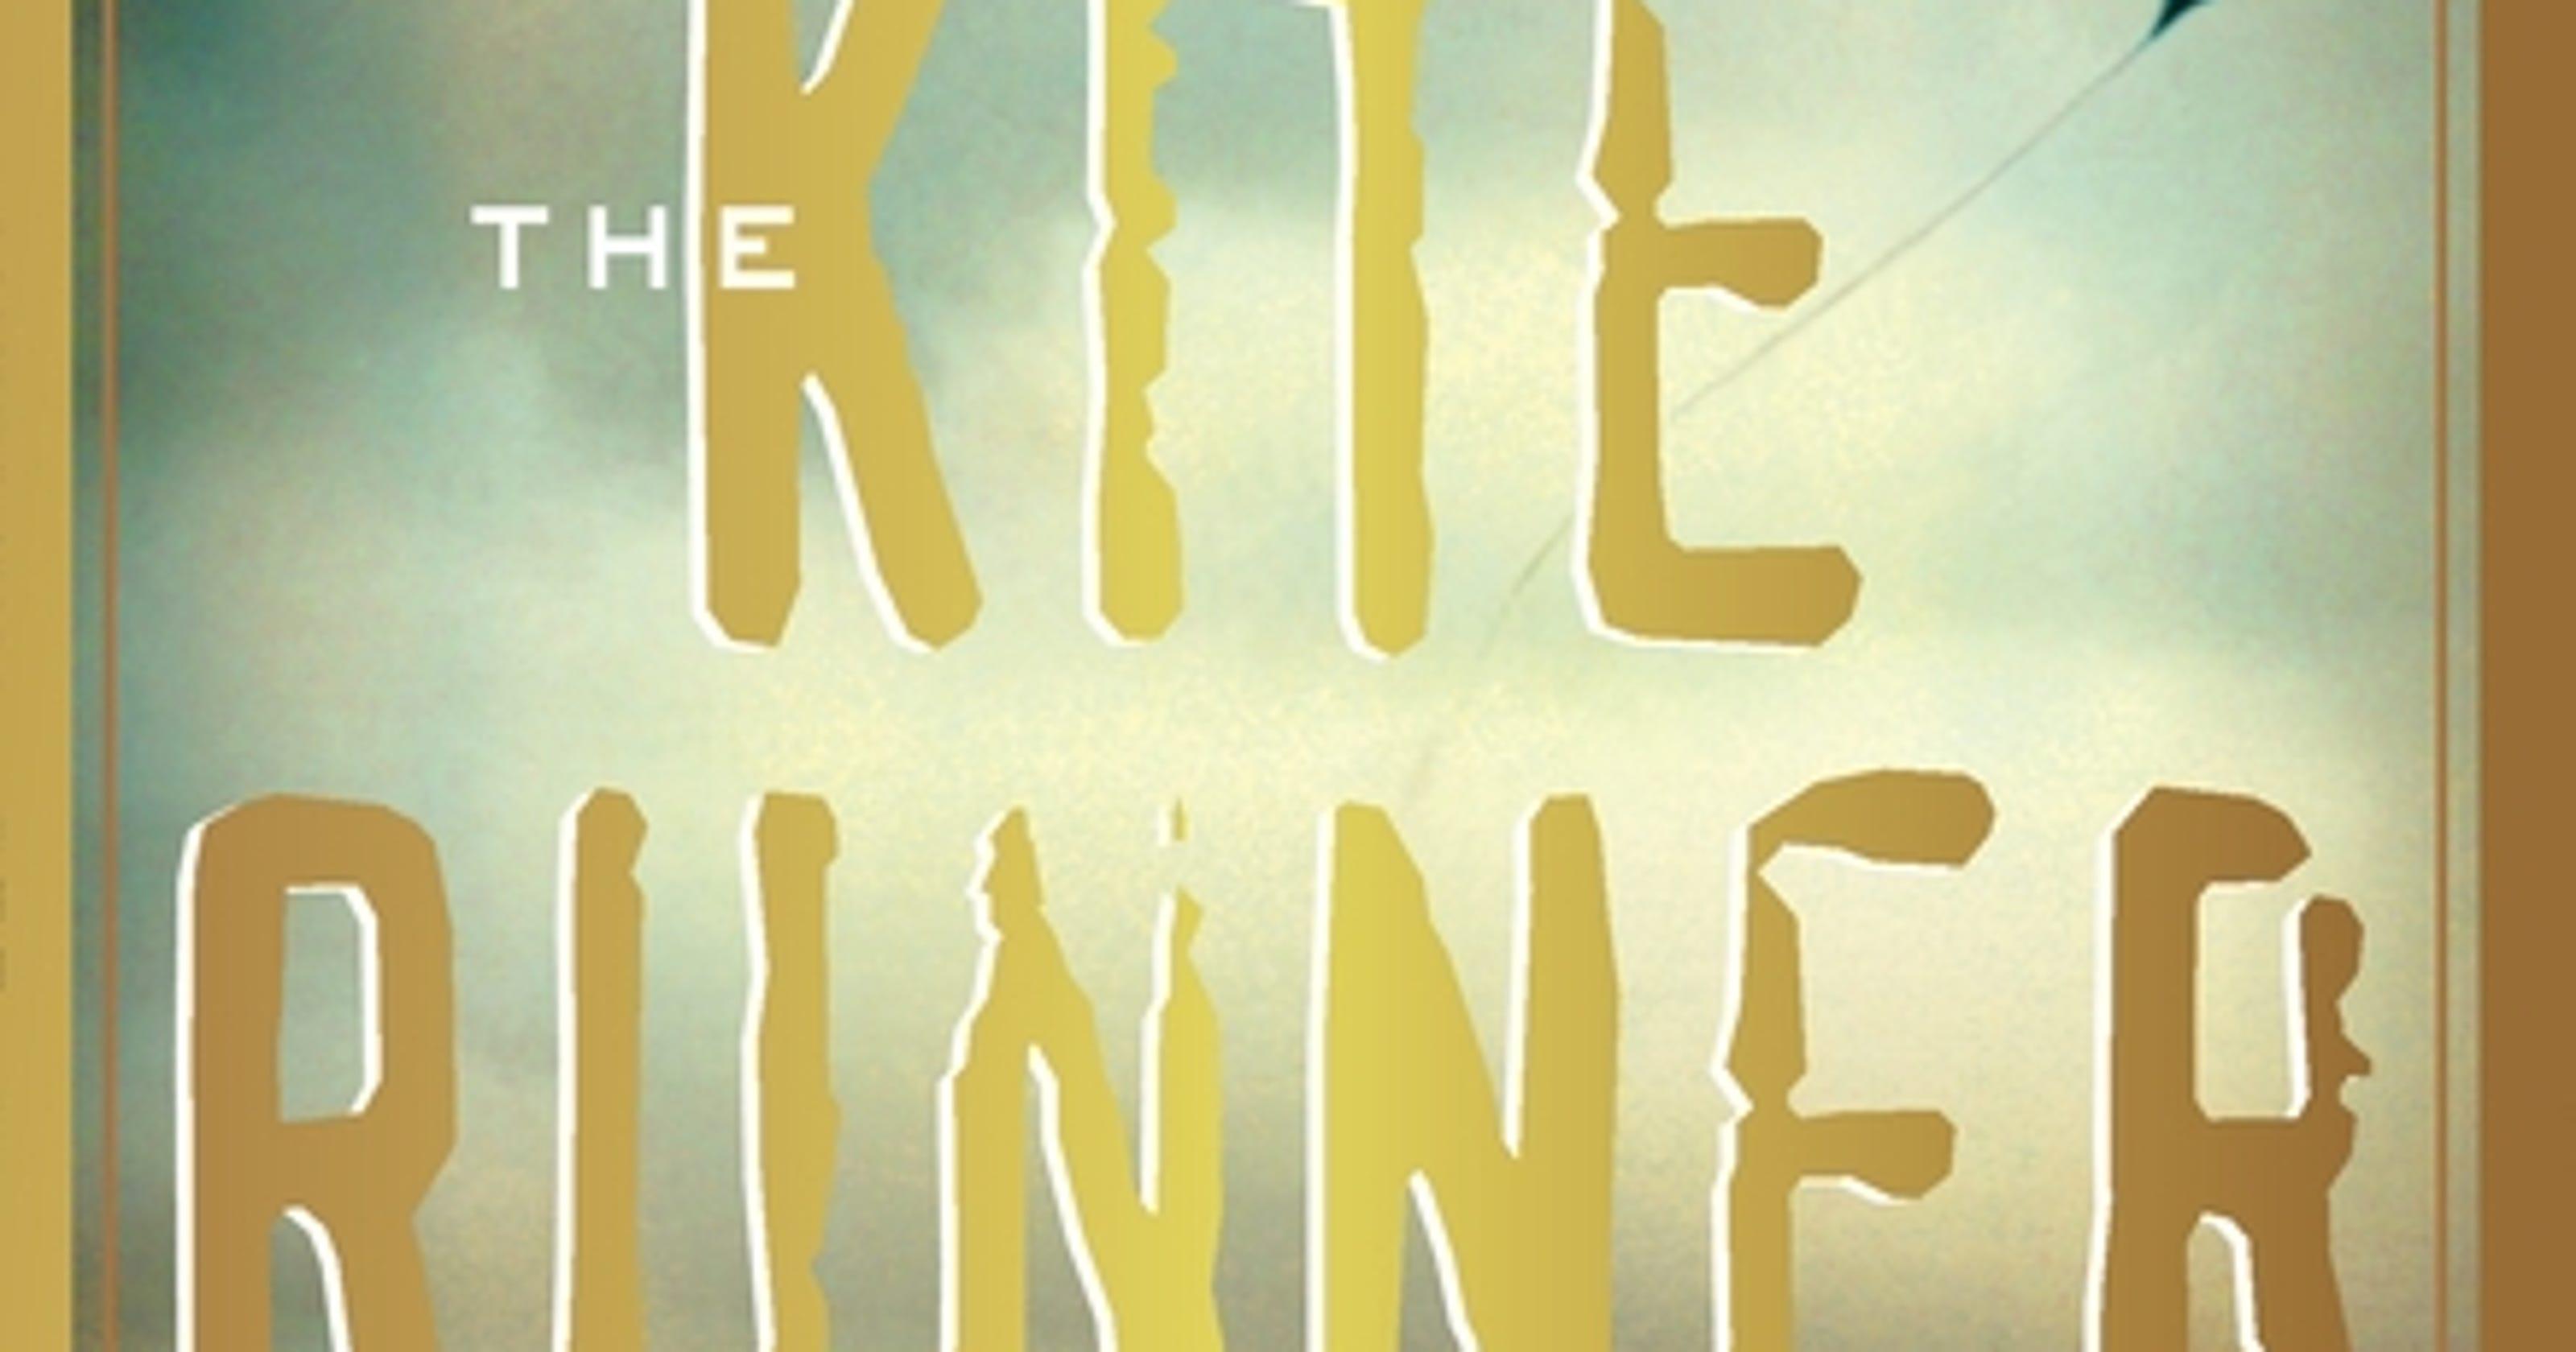 turning points in the kite runner